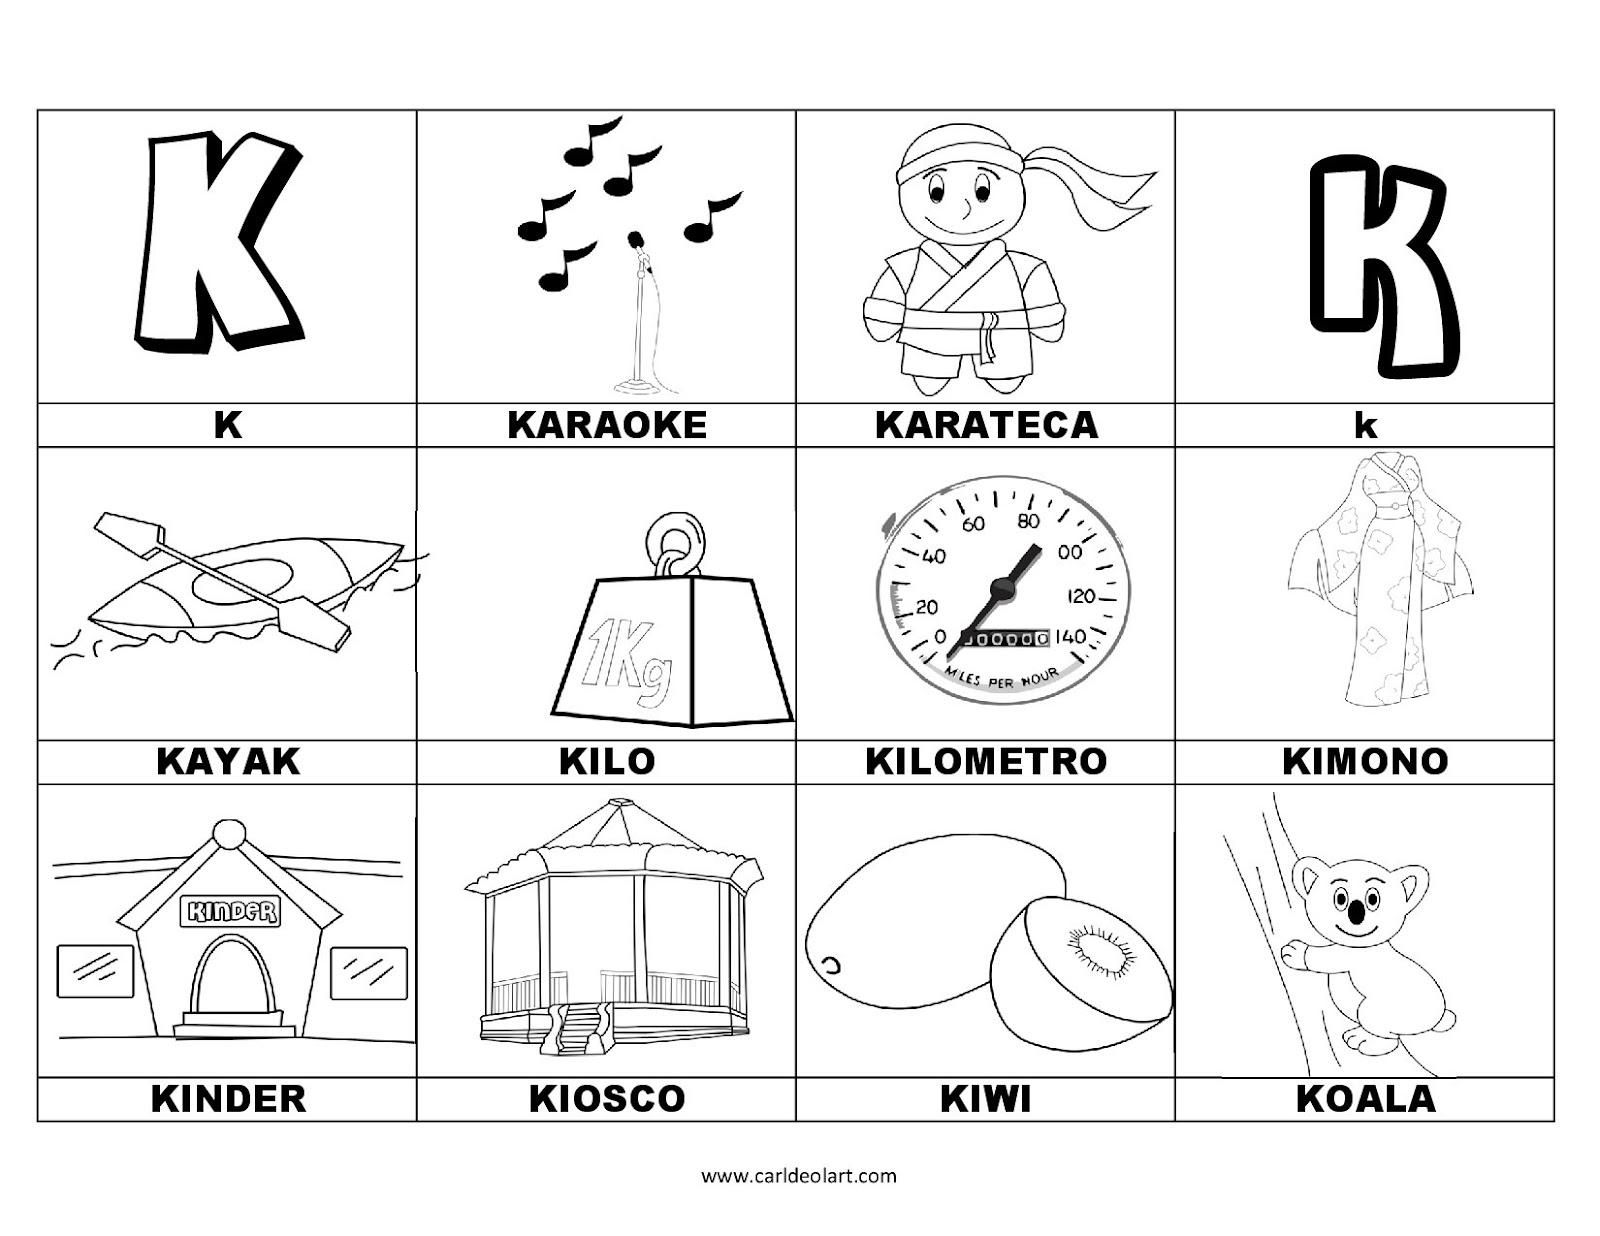 Dibujos Para Colorear Palabras Con K Dibujospacolorearcom